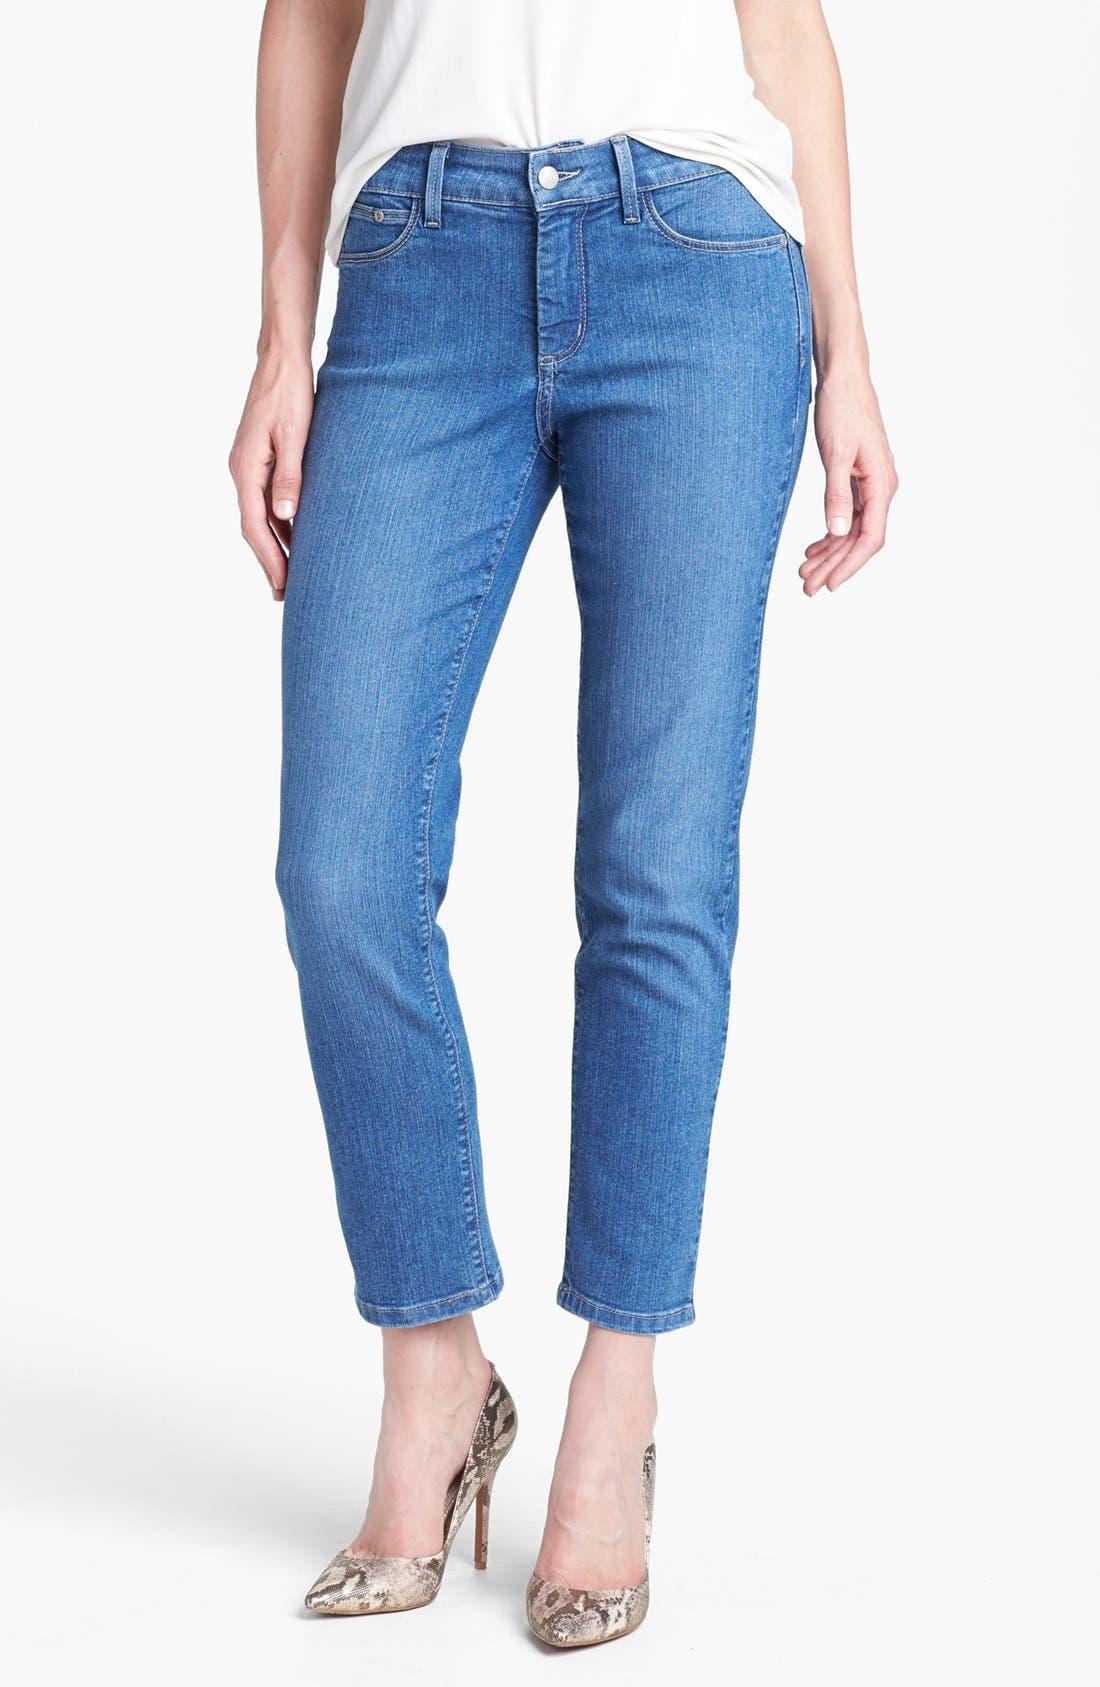 Alternate Image 1 Selected - NYDJ 'Alisha' Stretch Skinny Ankle Jeans